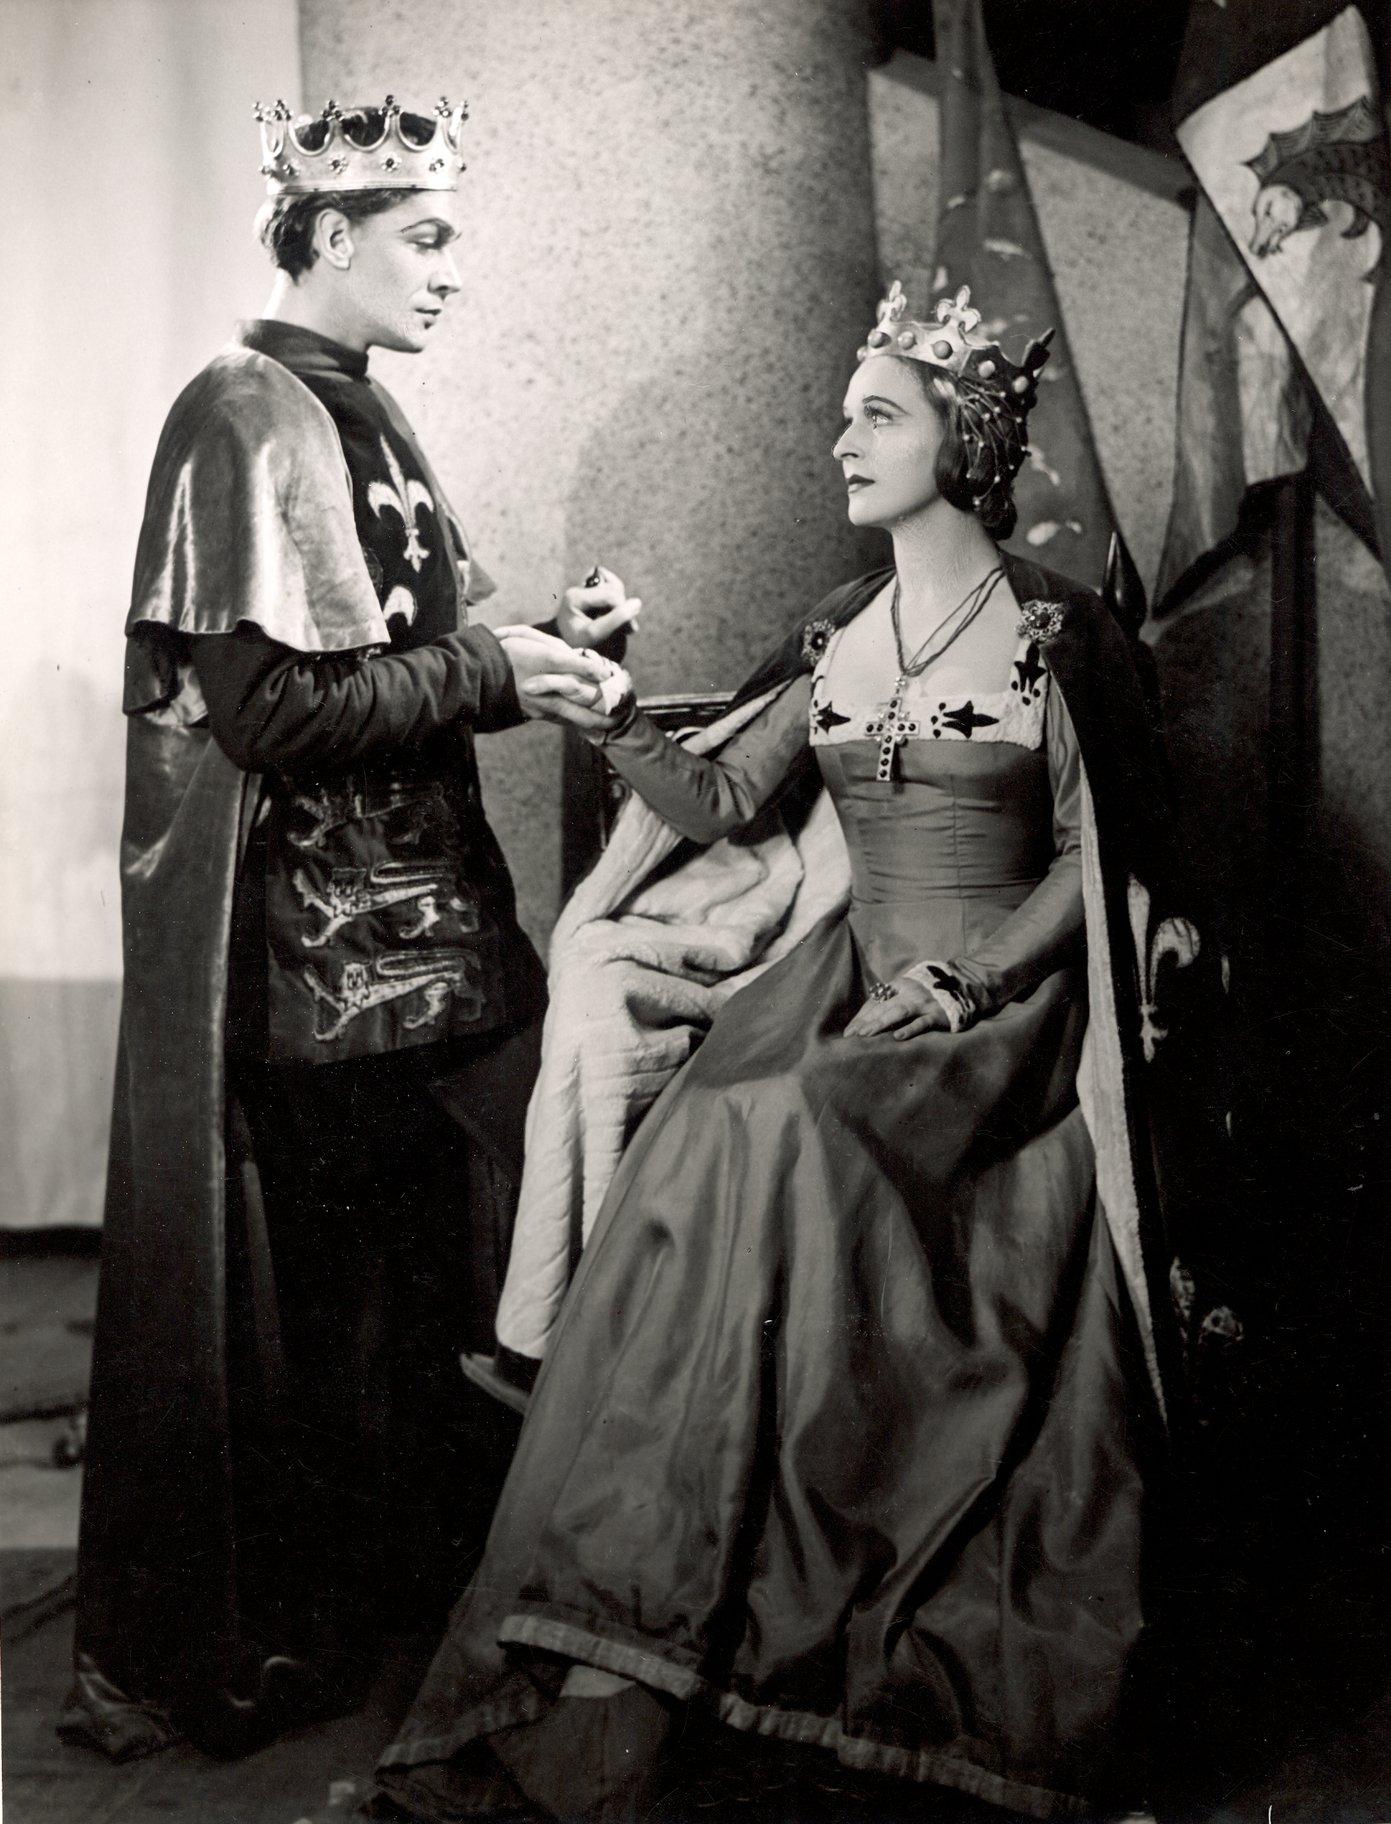 Henry V_ 1946_ Henry V woos Katherine_1946_Photo by Angus McBean _c_ RSC_119975